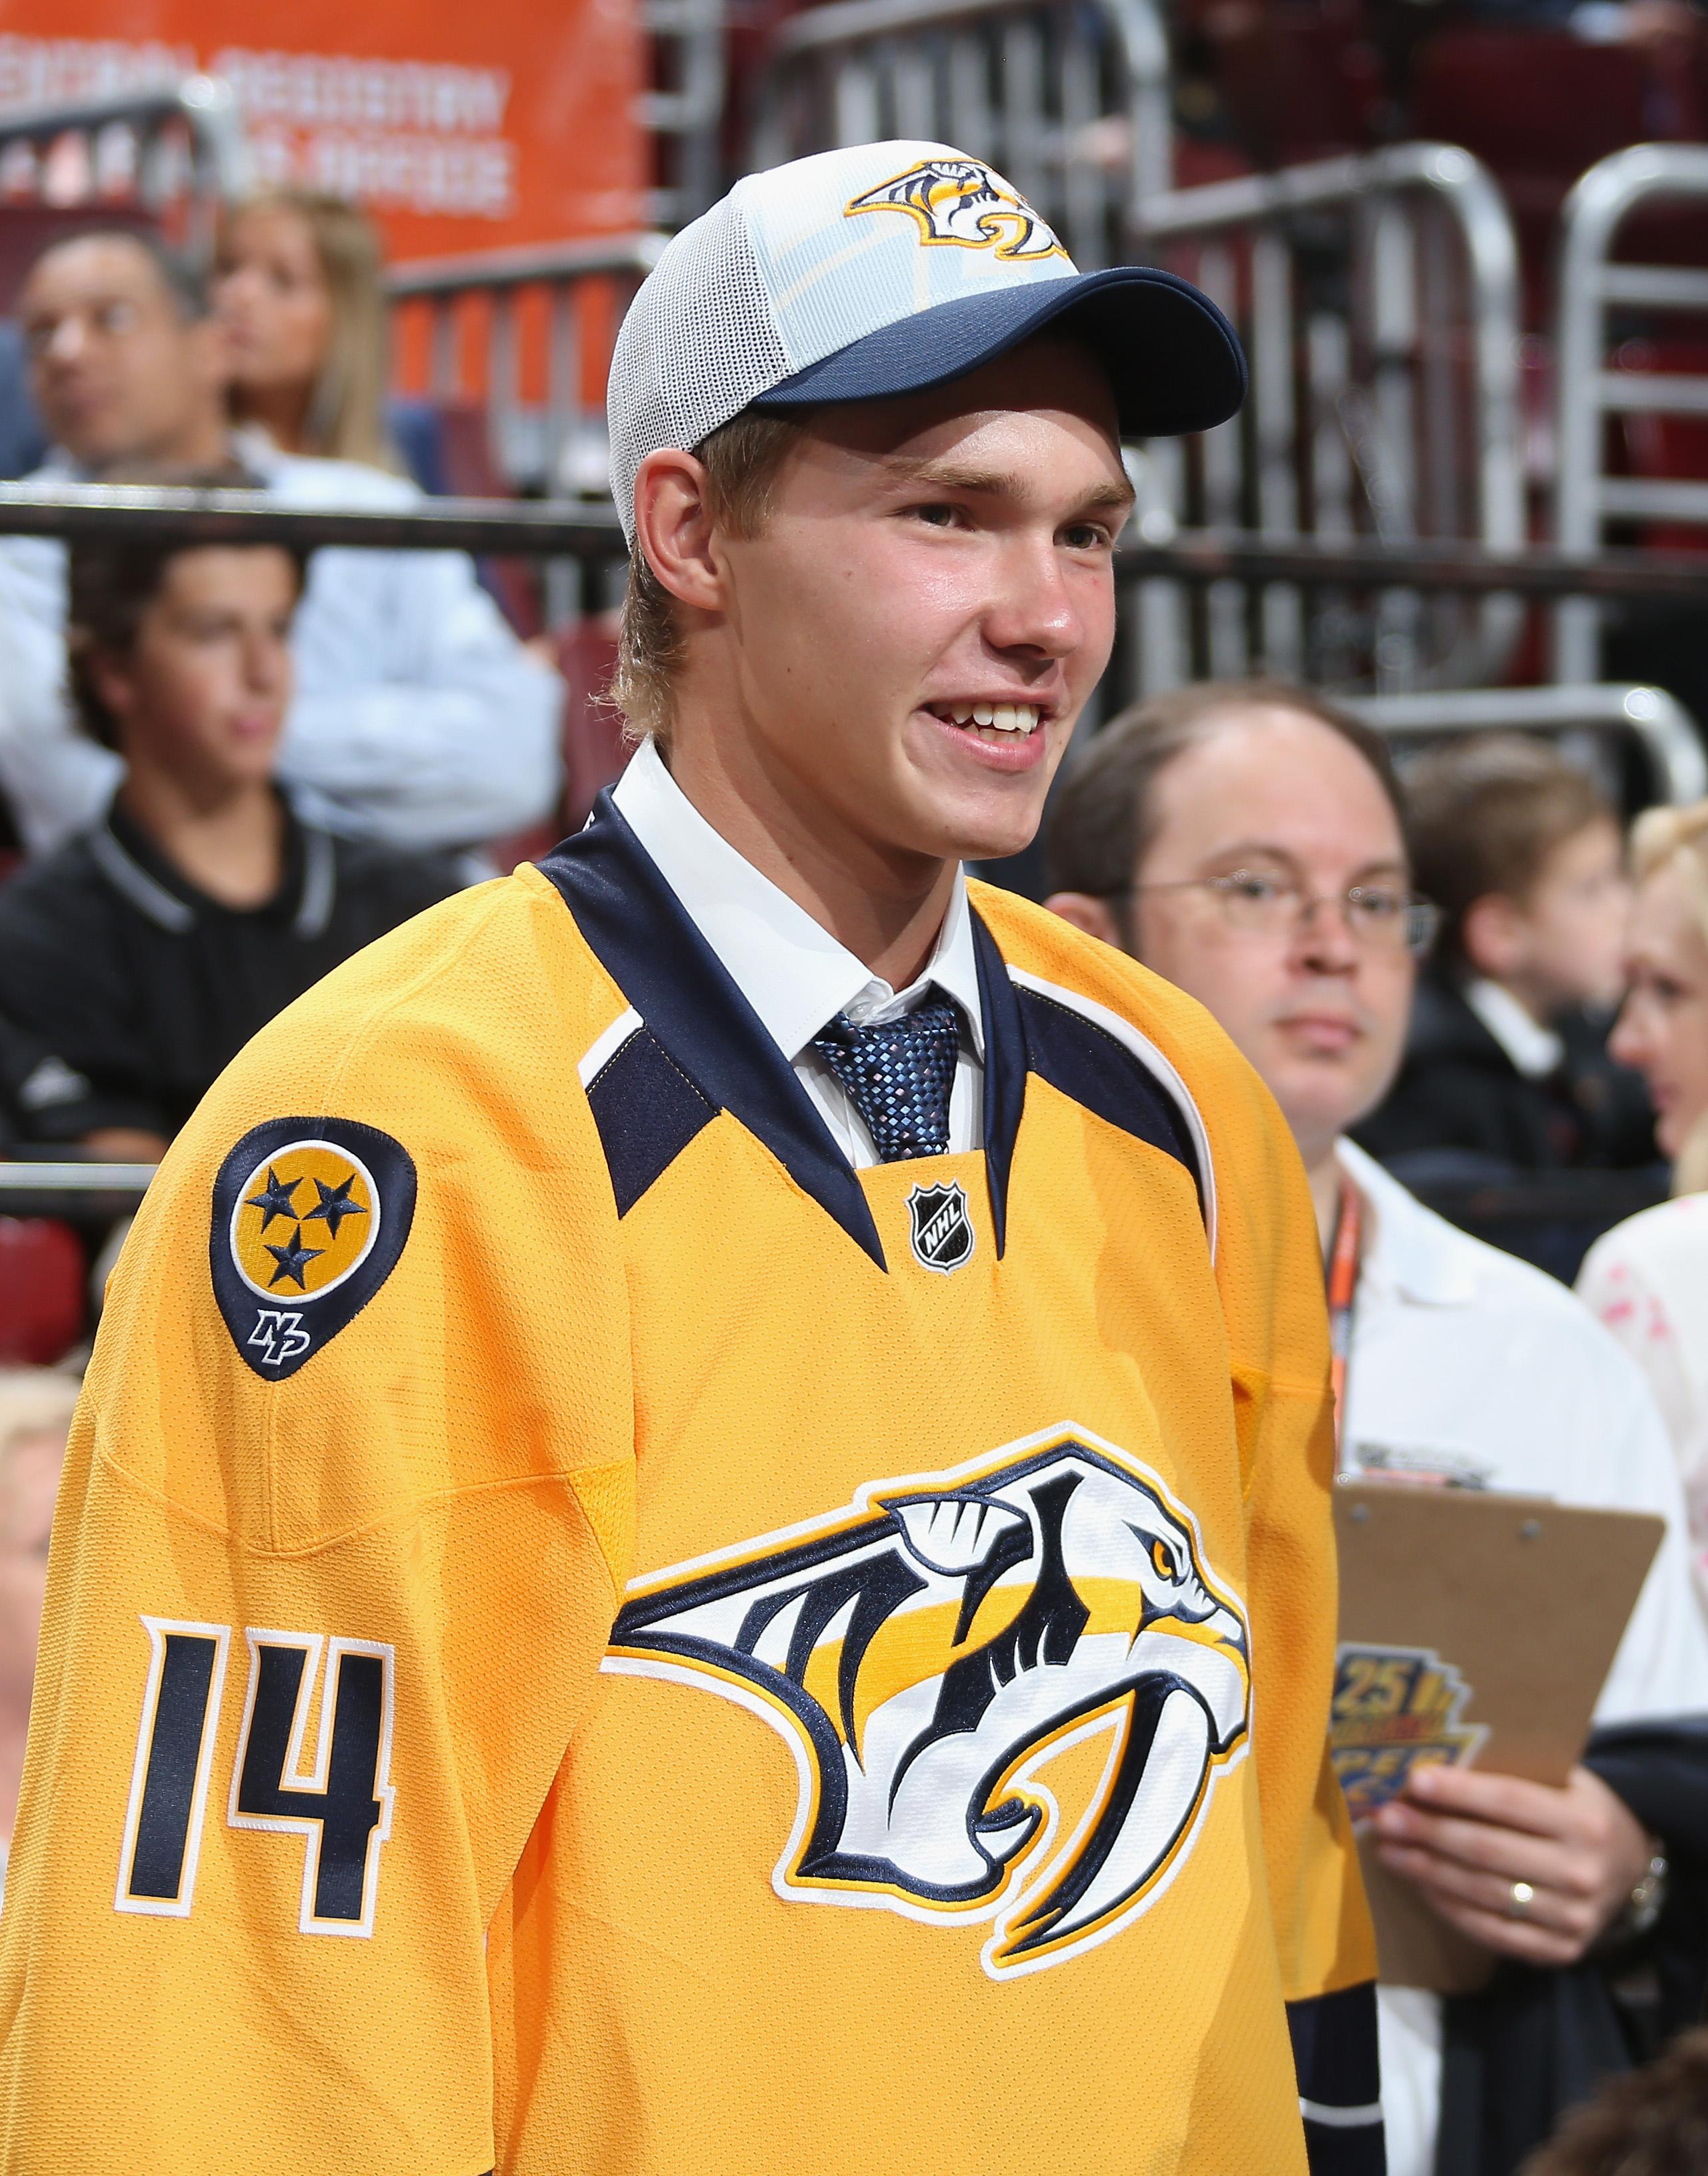 Top Predators center prospect, Vladislav Kamenev, after being drafted in the 2014 Draft.